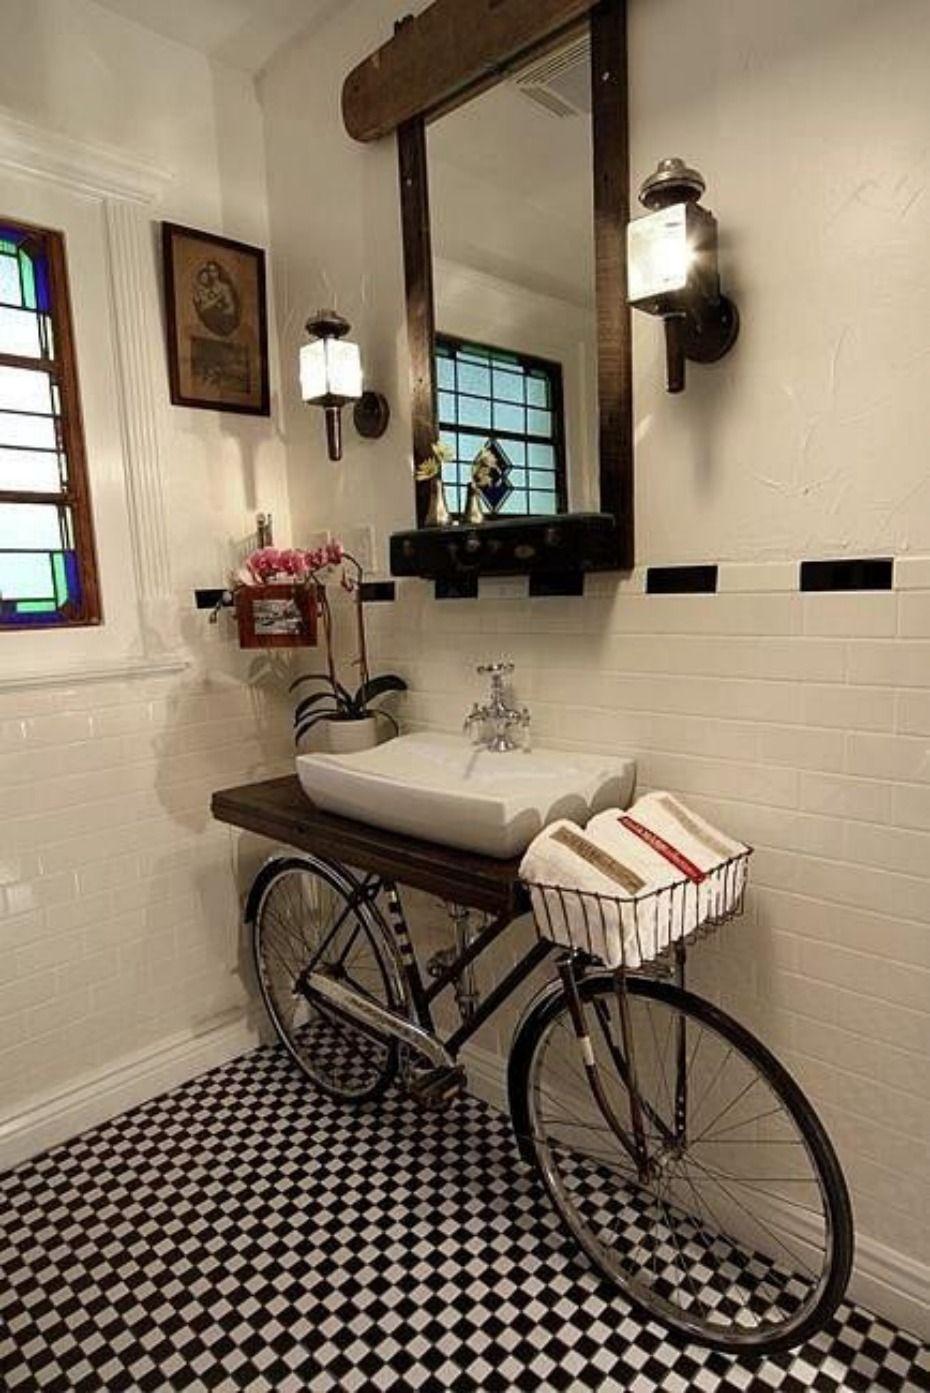 Te Apuntas A La Moda Deco Bike Lavabo Bicicleta Y Ba Os # Muebles Bicicleta